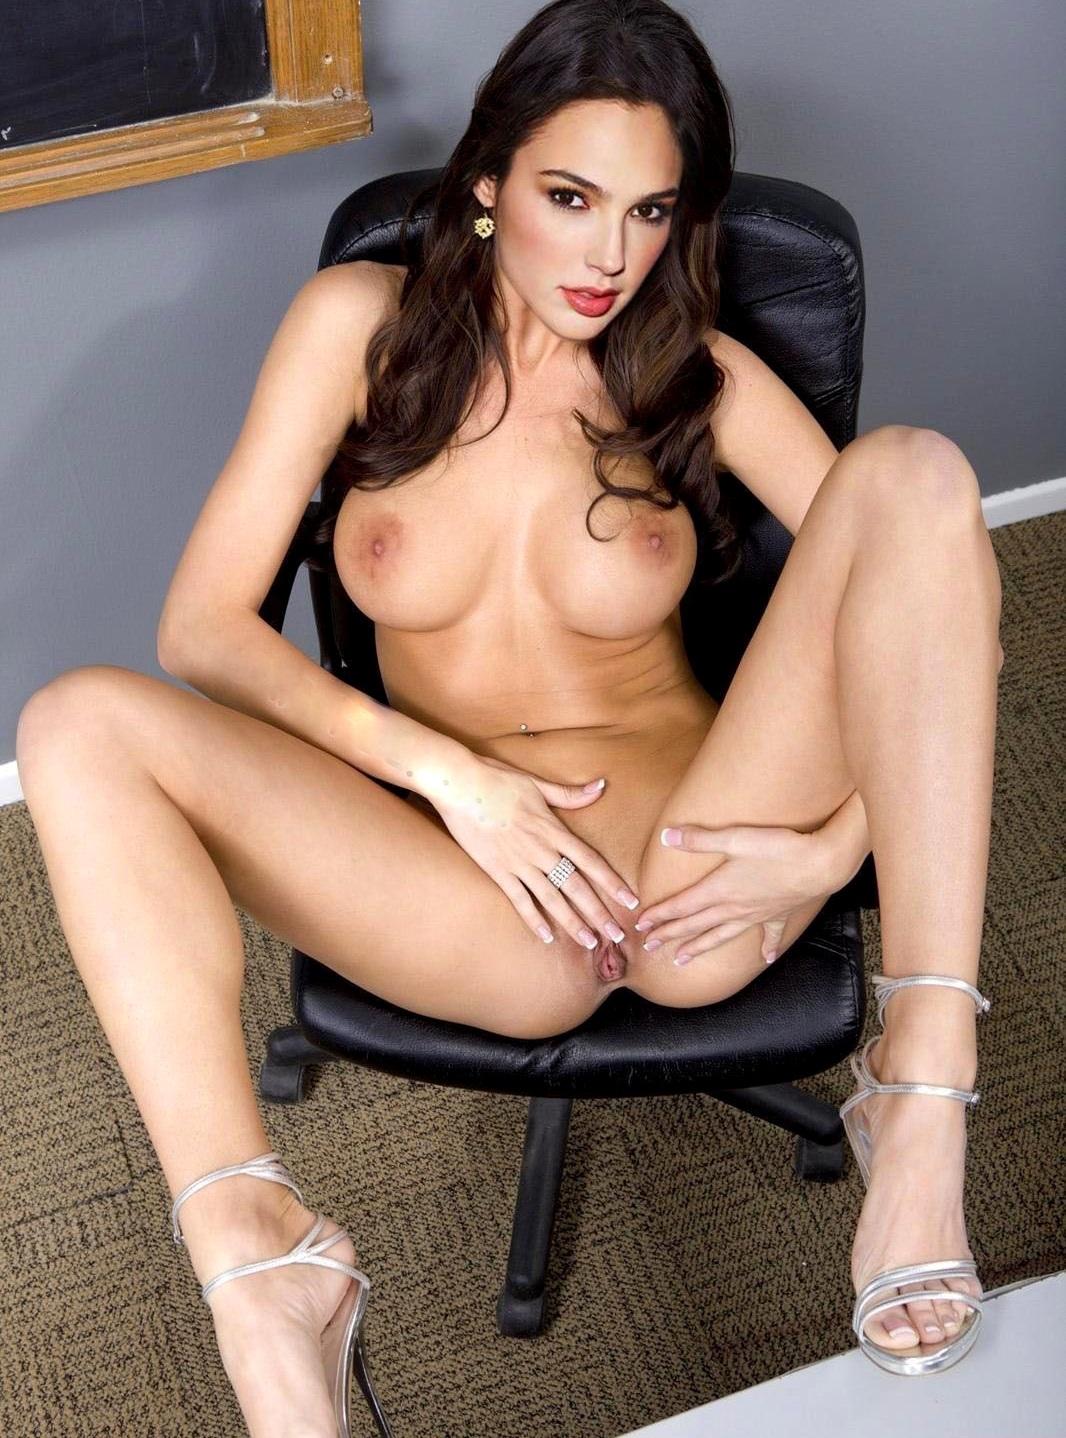 Fake porn photo of wonder woman star gal gadot goes viral